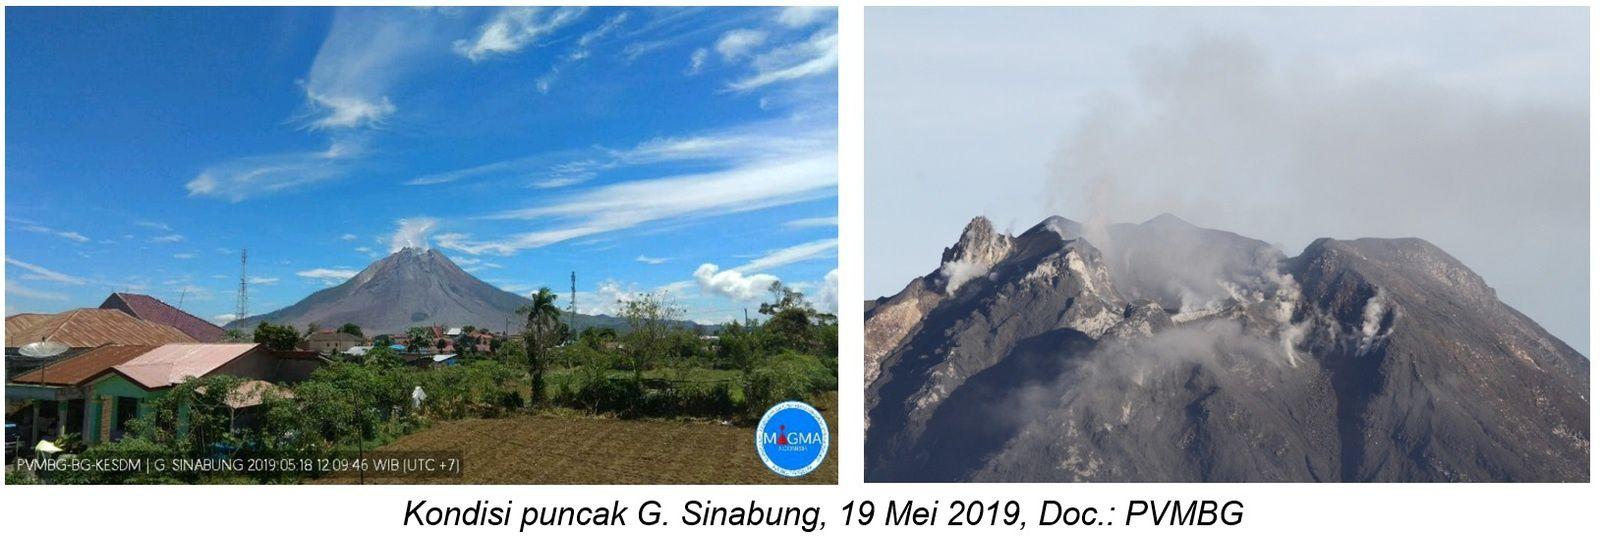 Sinabung - 18.05.2019 / 12h09 WIB  - Doc. PVMBG / Magma Indonesia - un clic pour agrandir